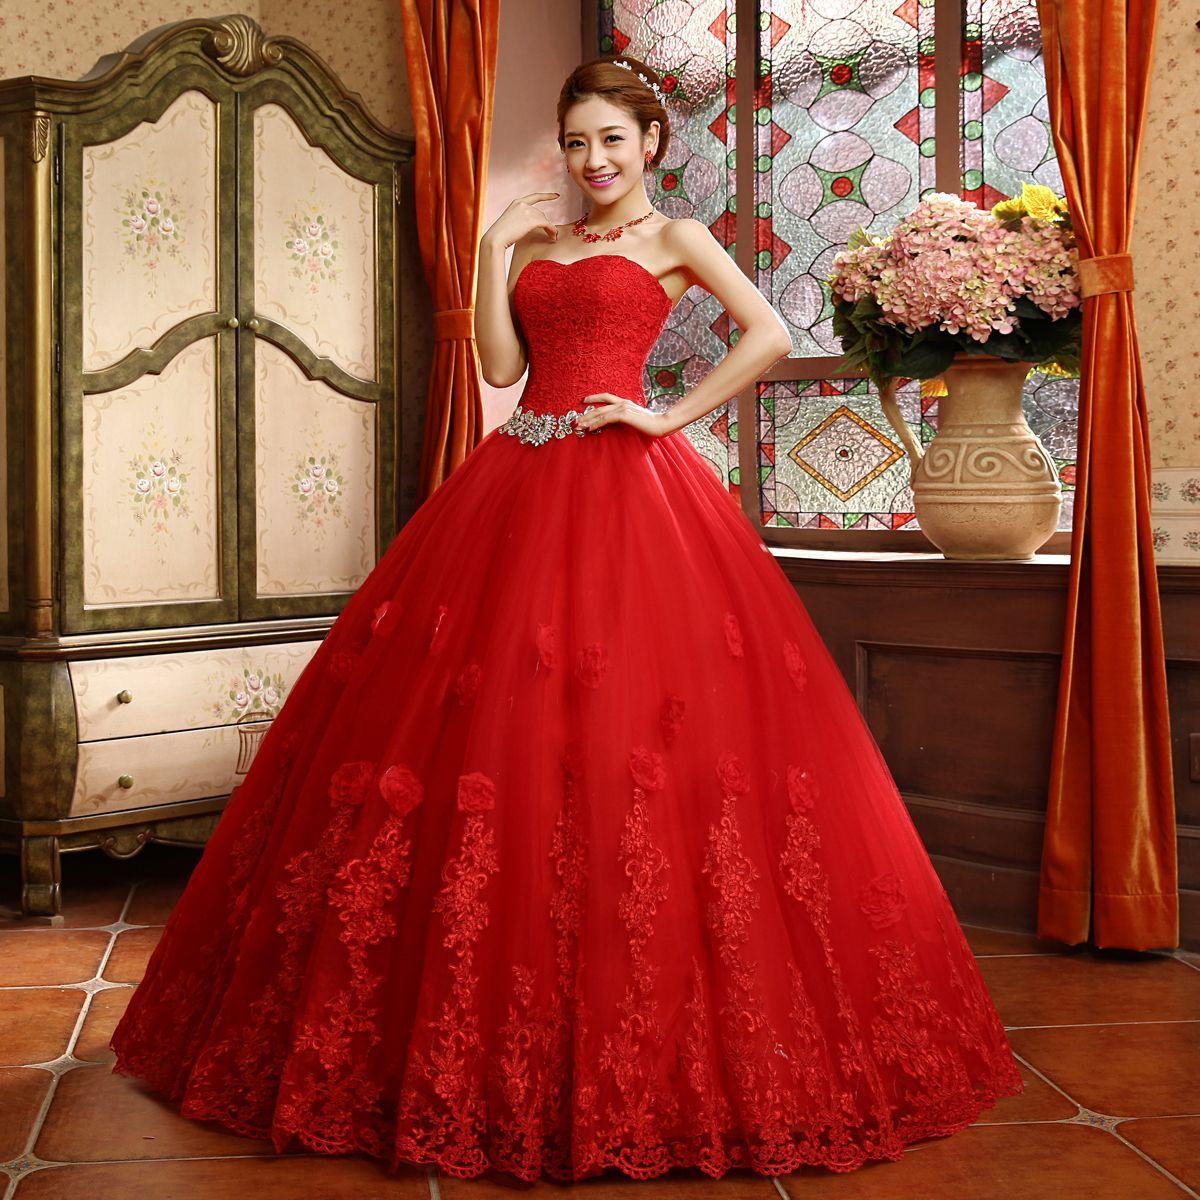 2018 Best Online Wedding Dress Sites - Dressy Dresses for Weddings ...